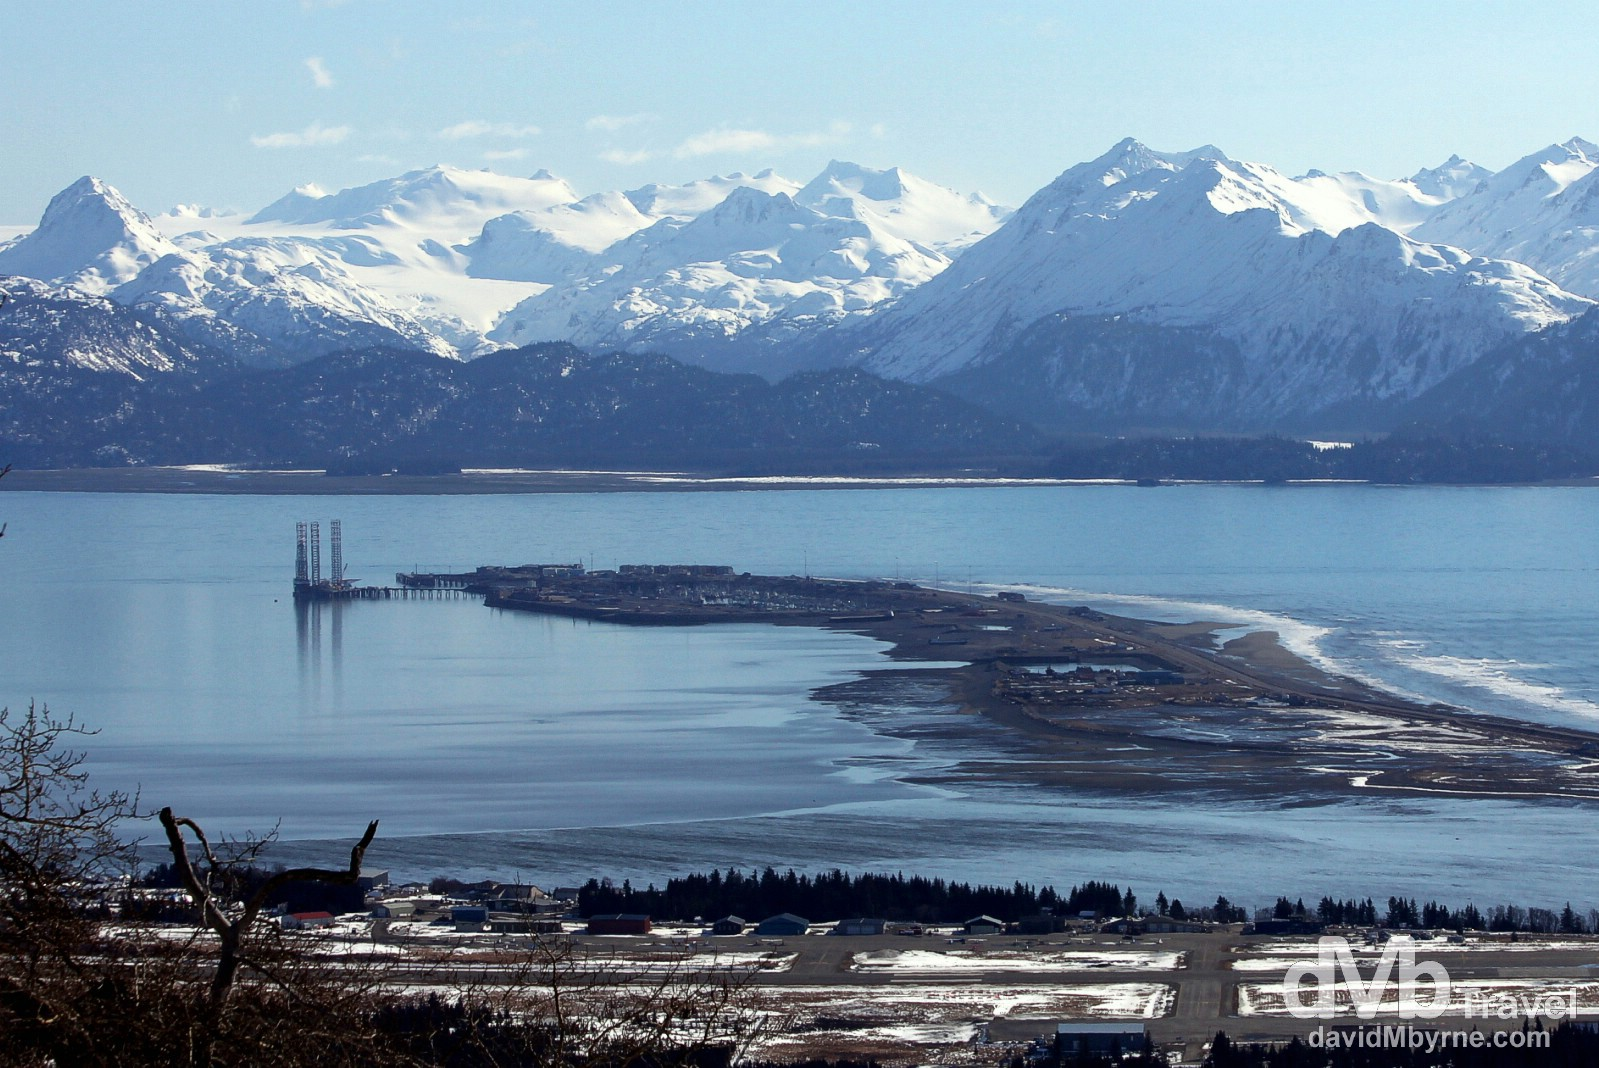 The Homer Spit as seen from Skyline Drive in Homer, Kenai Peninsula, Alaska, USA. March 17th 2013.